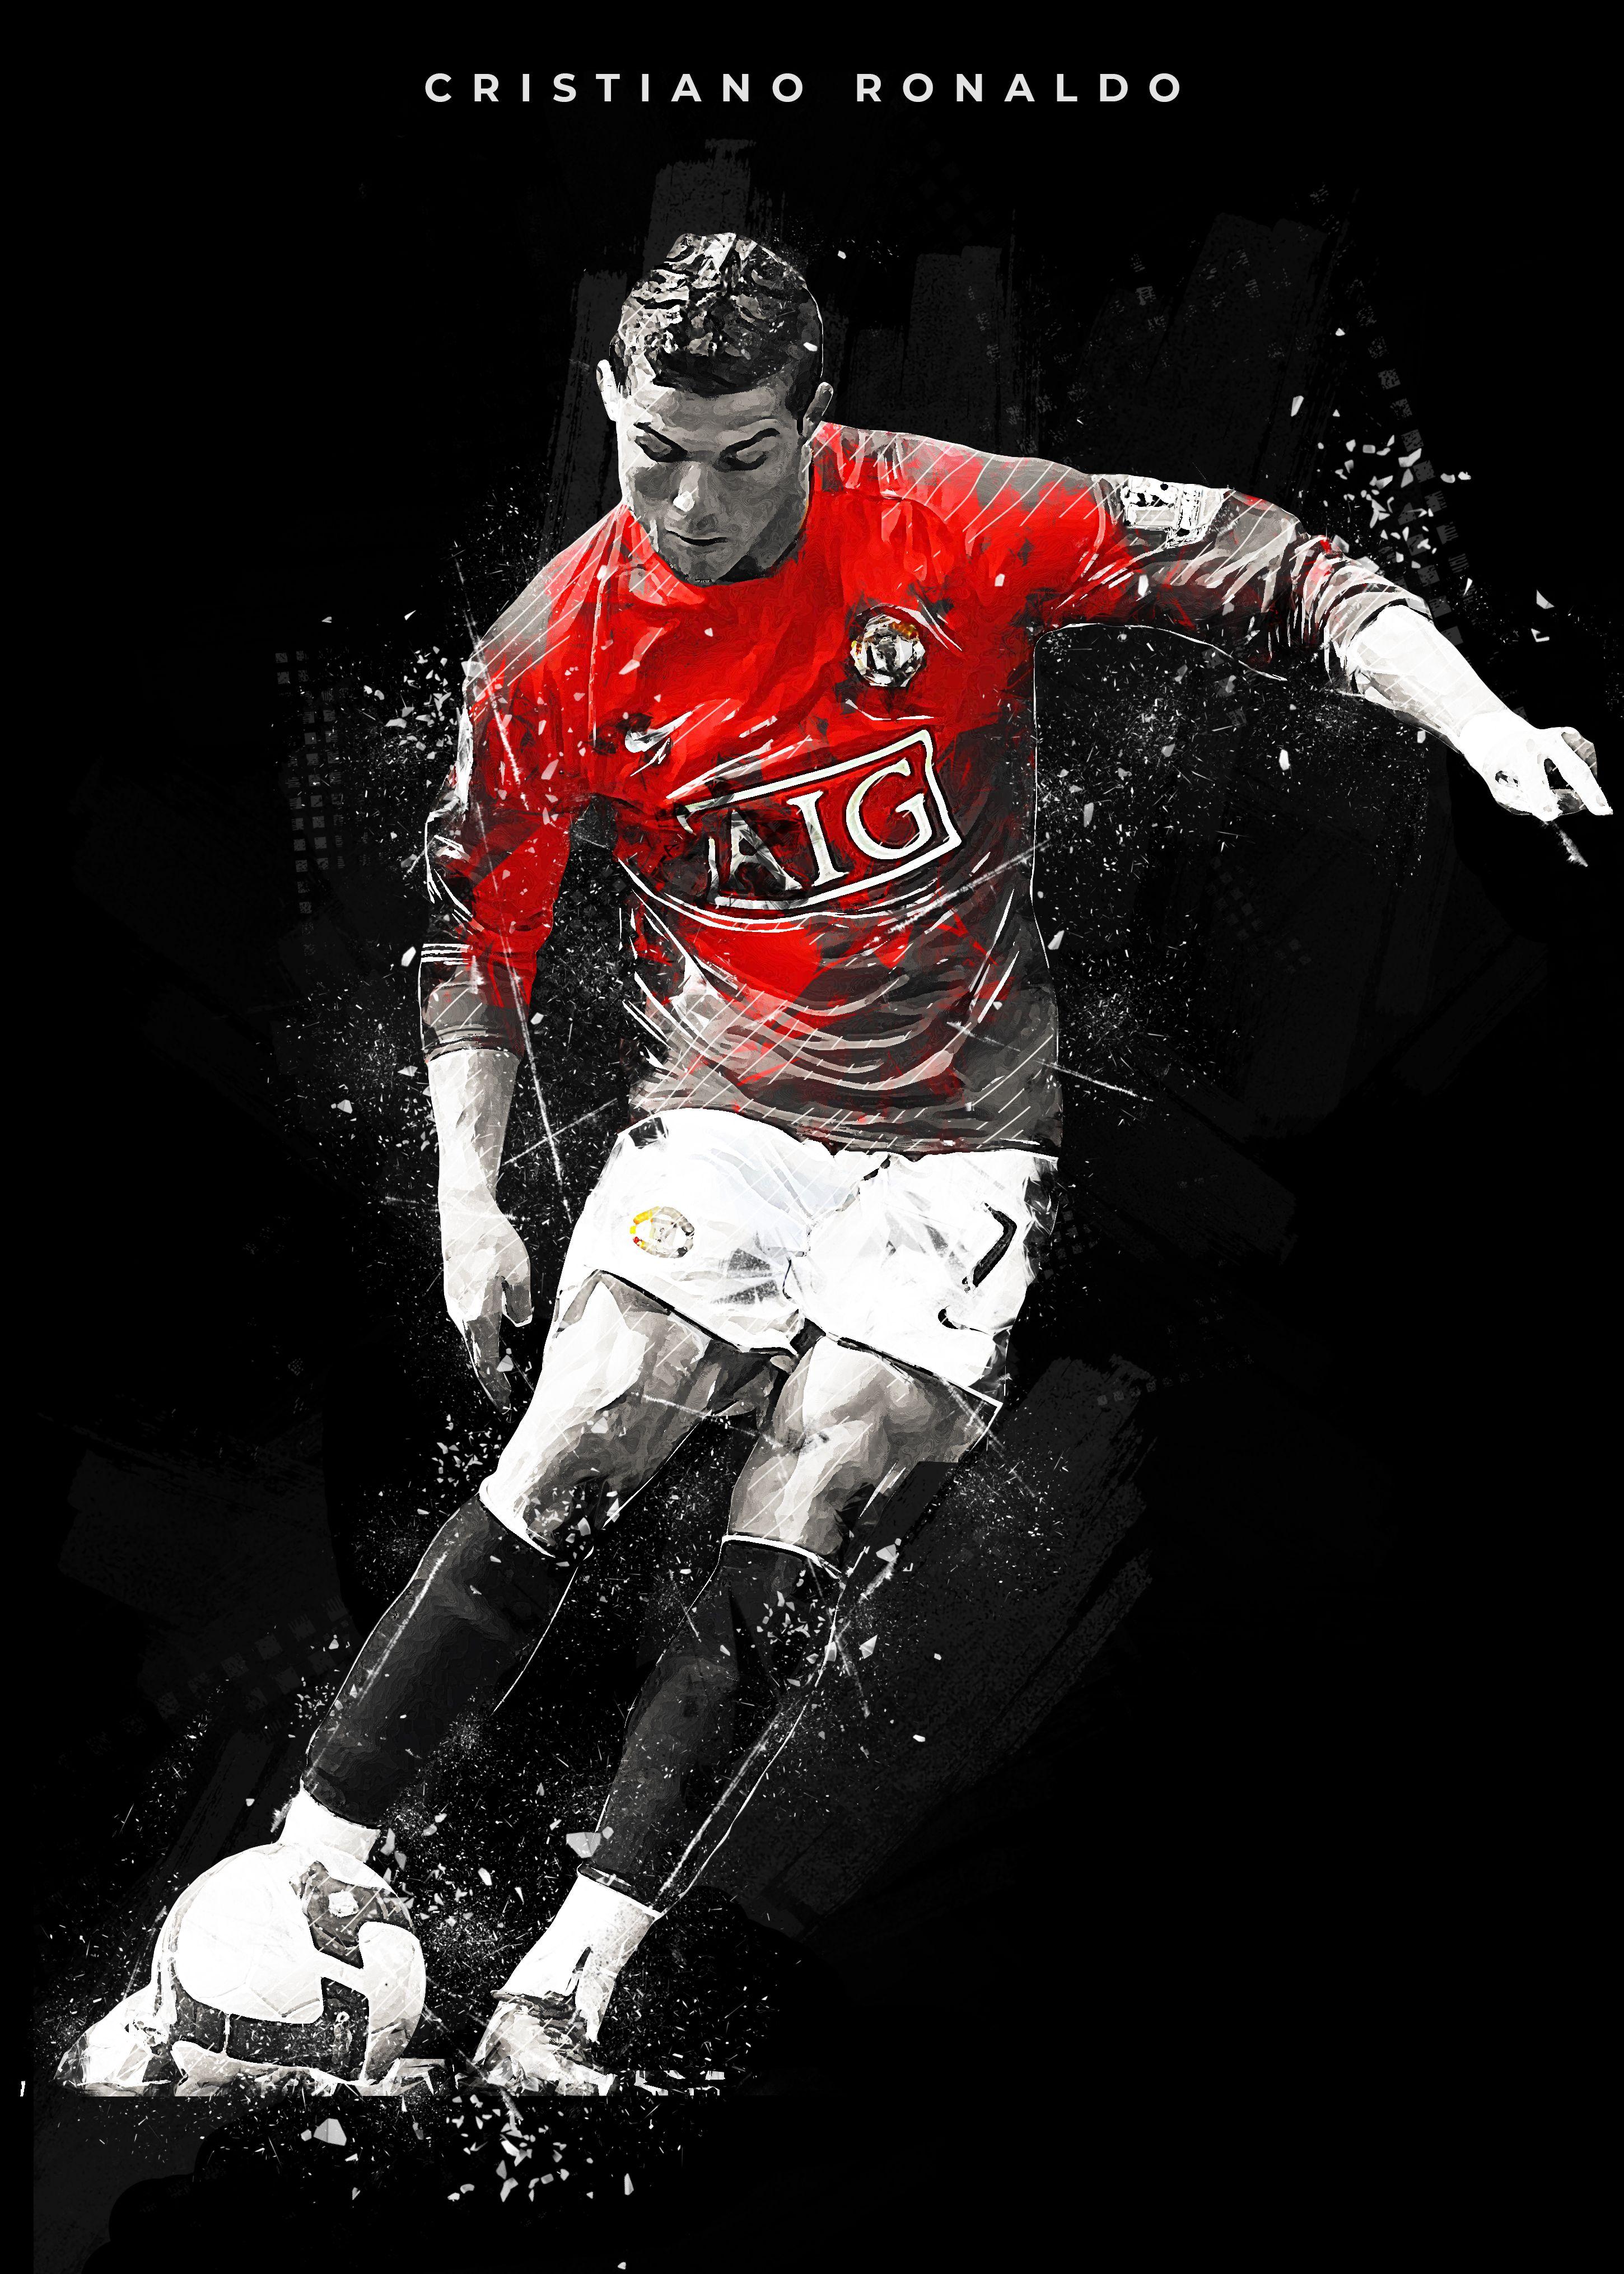 Cristiano Ronaldo Poster By Creativedy Stuff Displate Manchester United Ronaldo Cristiano Ronaldo Ronaldo